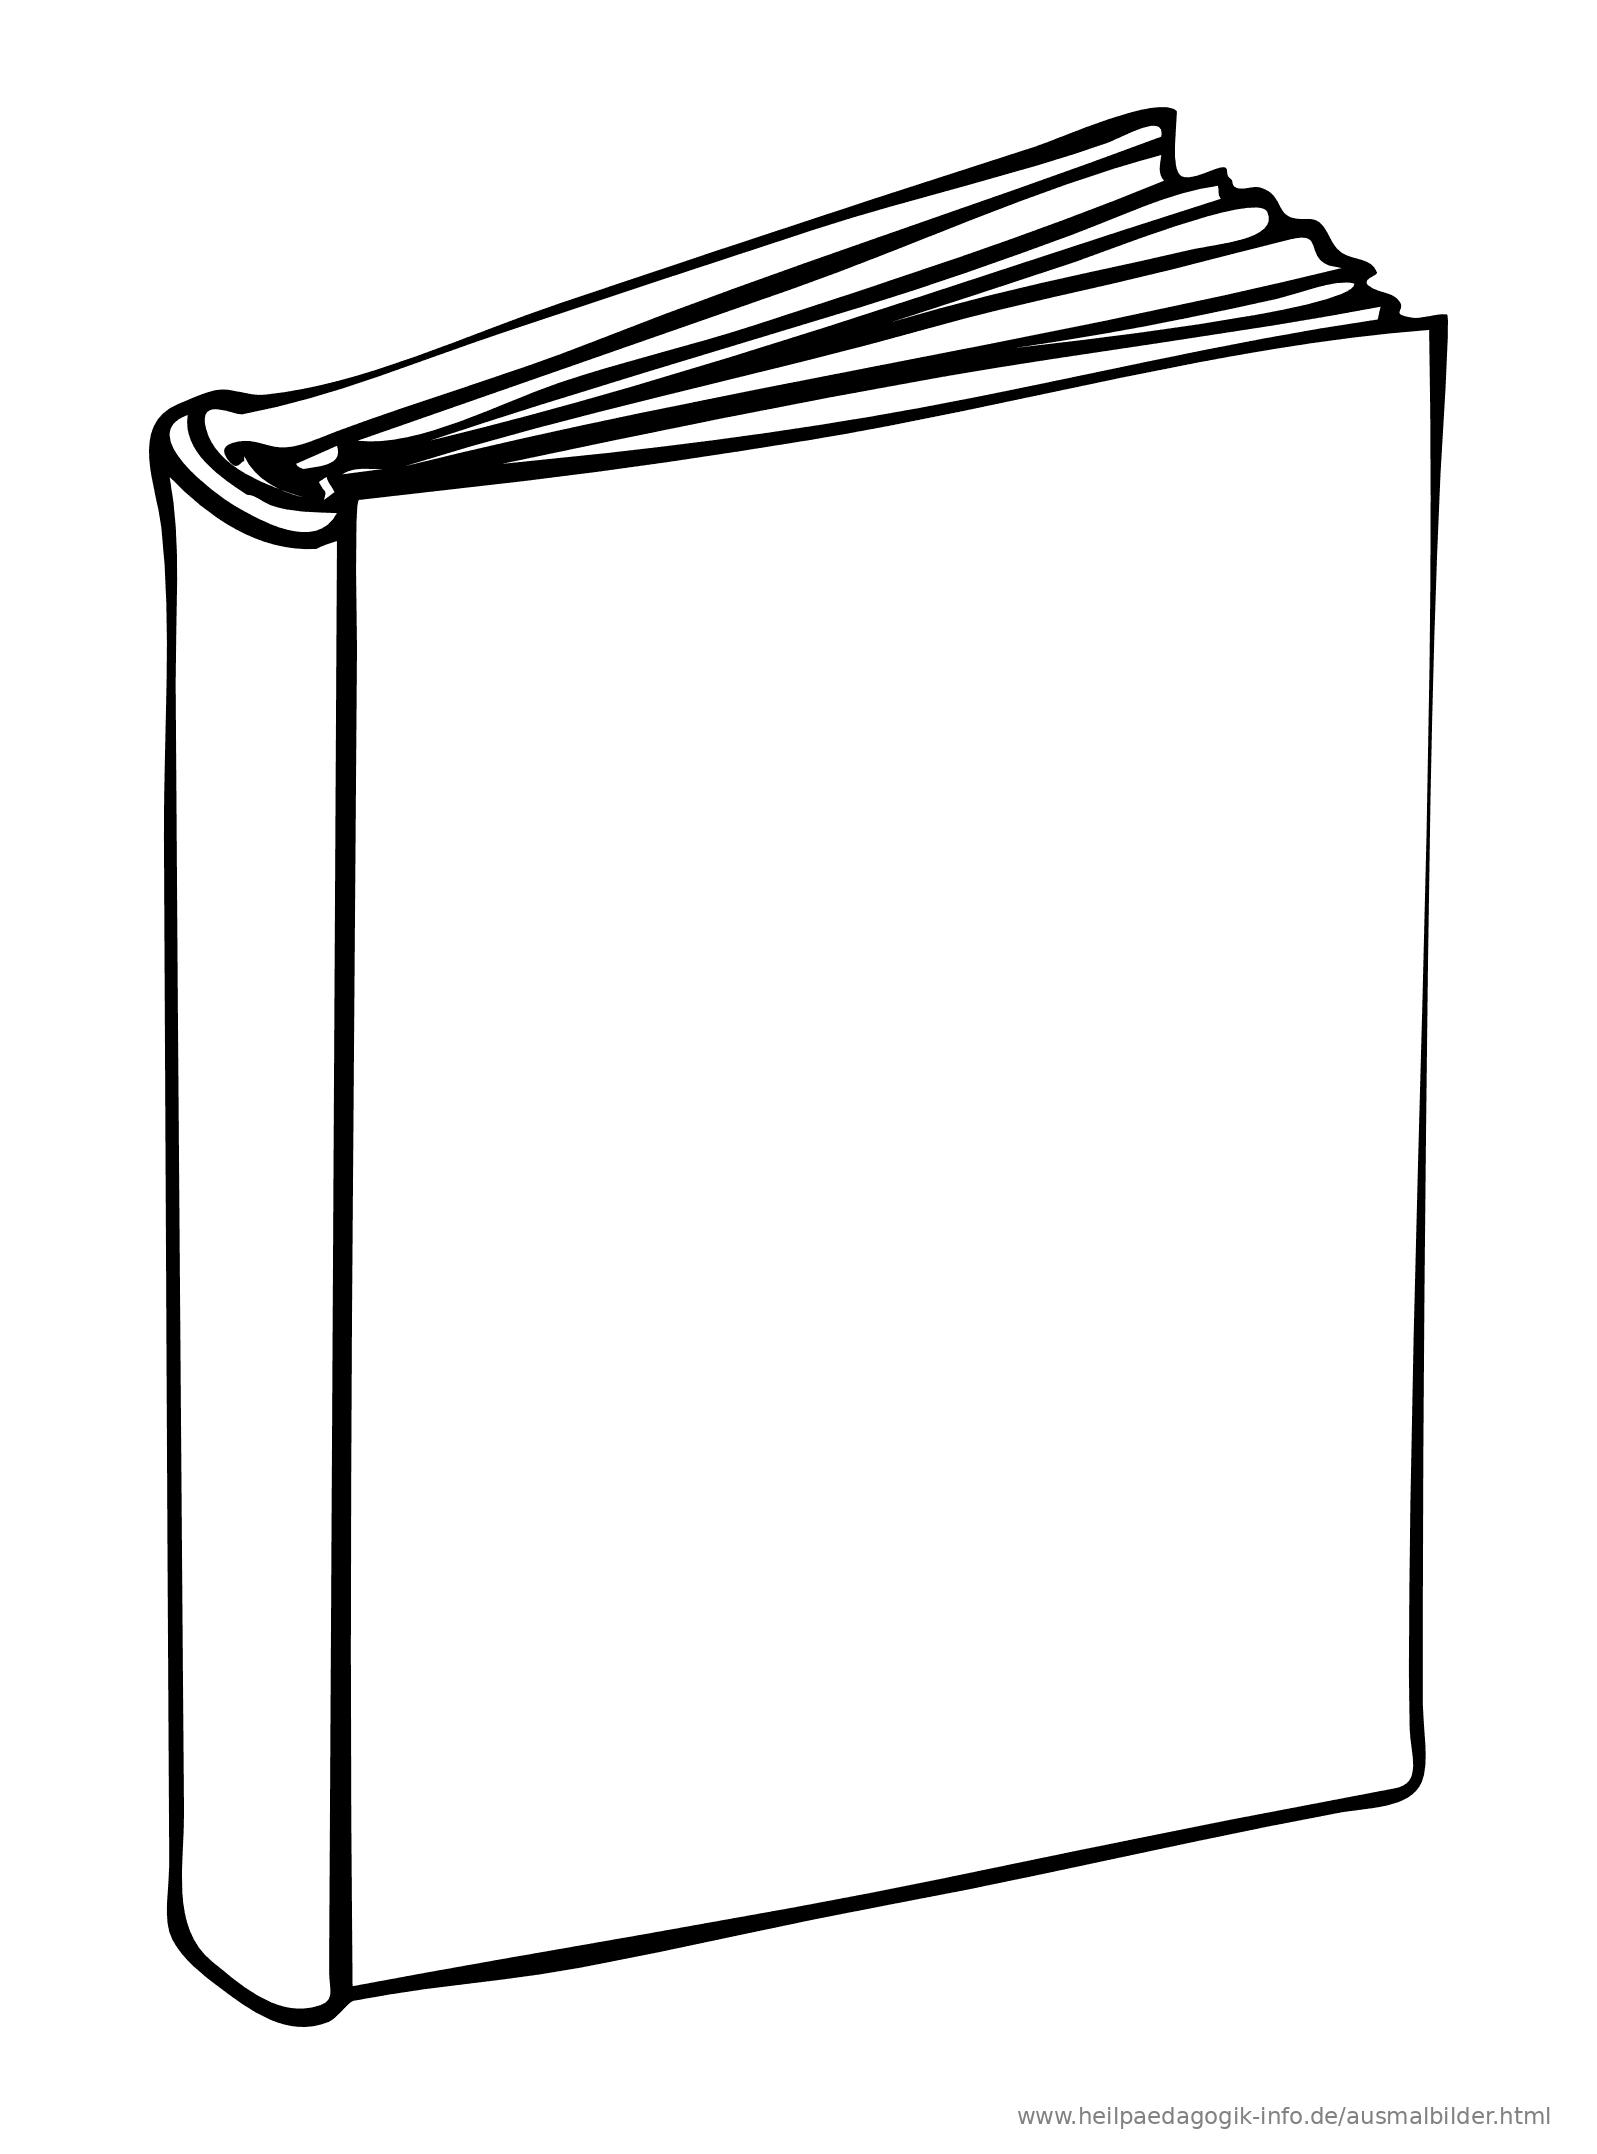 Malvorlage Buch Related Keywords Suggestions Malvorlage Buch